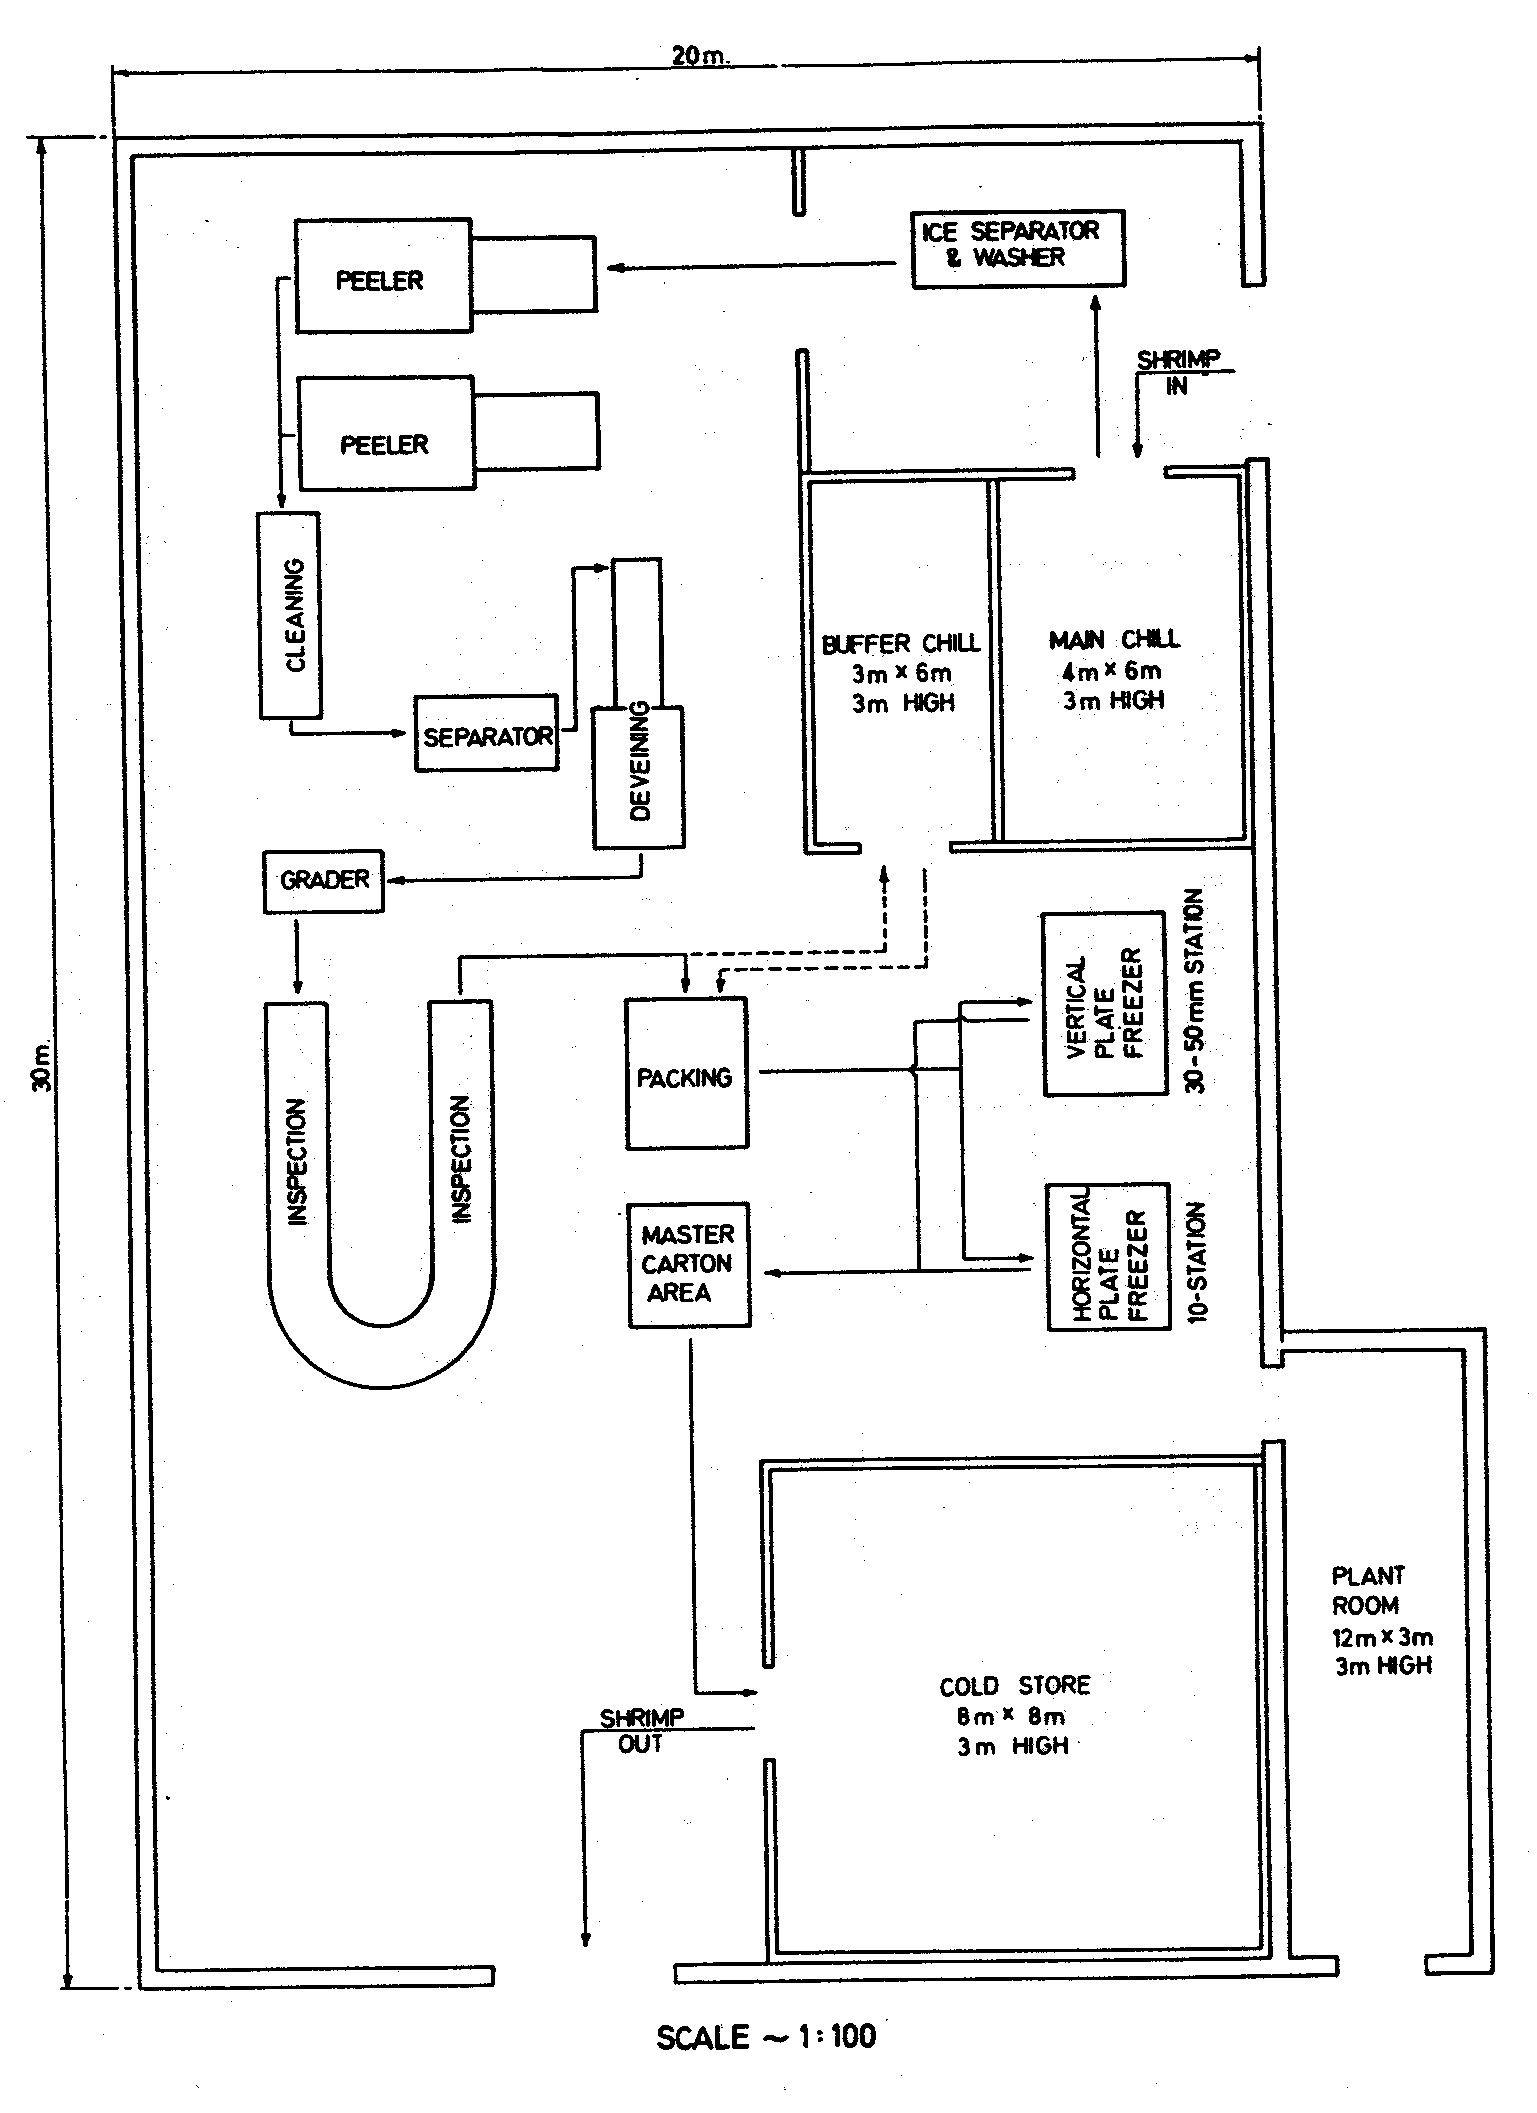 21 Work Shop Floor Plans Image Result For Typical Medium Scale Industry Floor Plan Shop House Plans Floor Plan Design Floor Plan Drawing